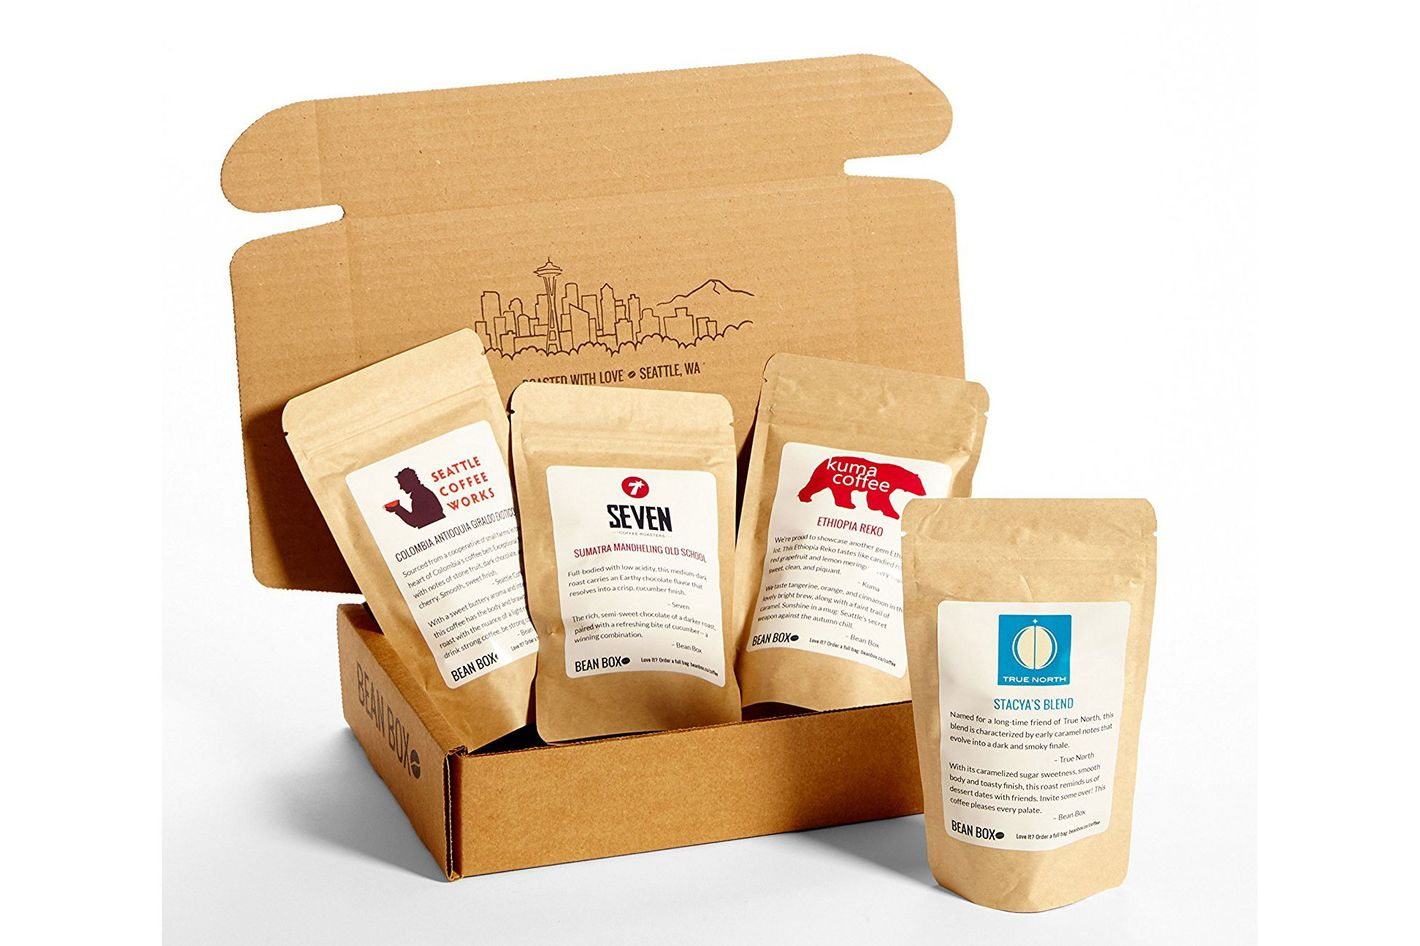 Bean Box Gourmet Coffee Sampler